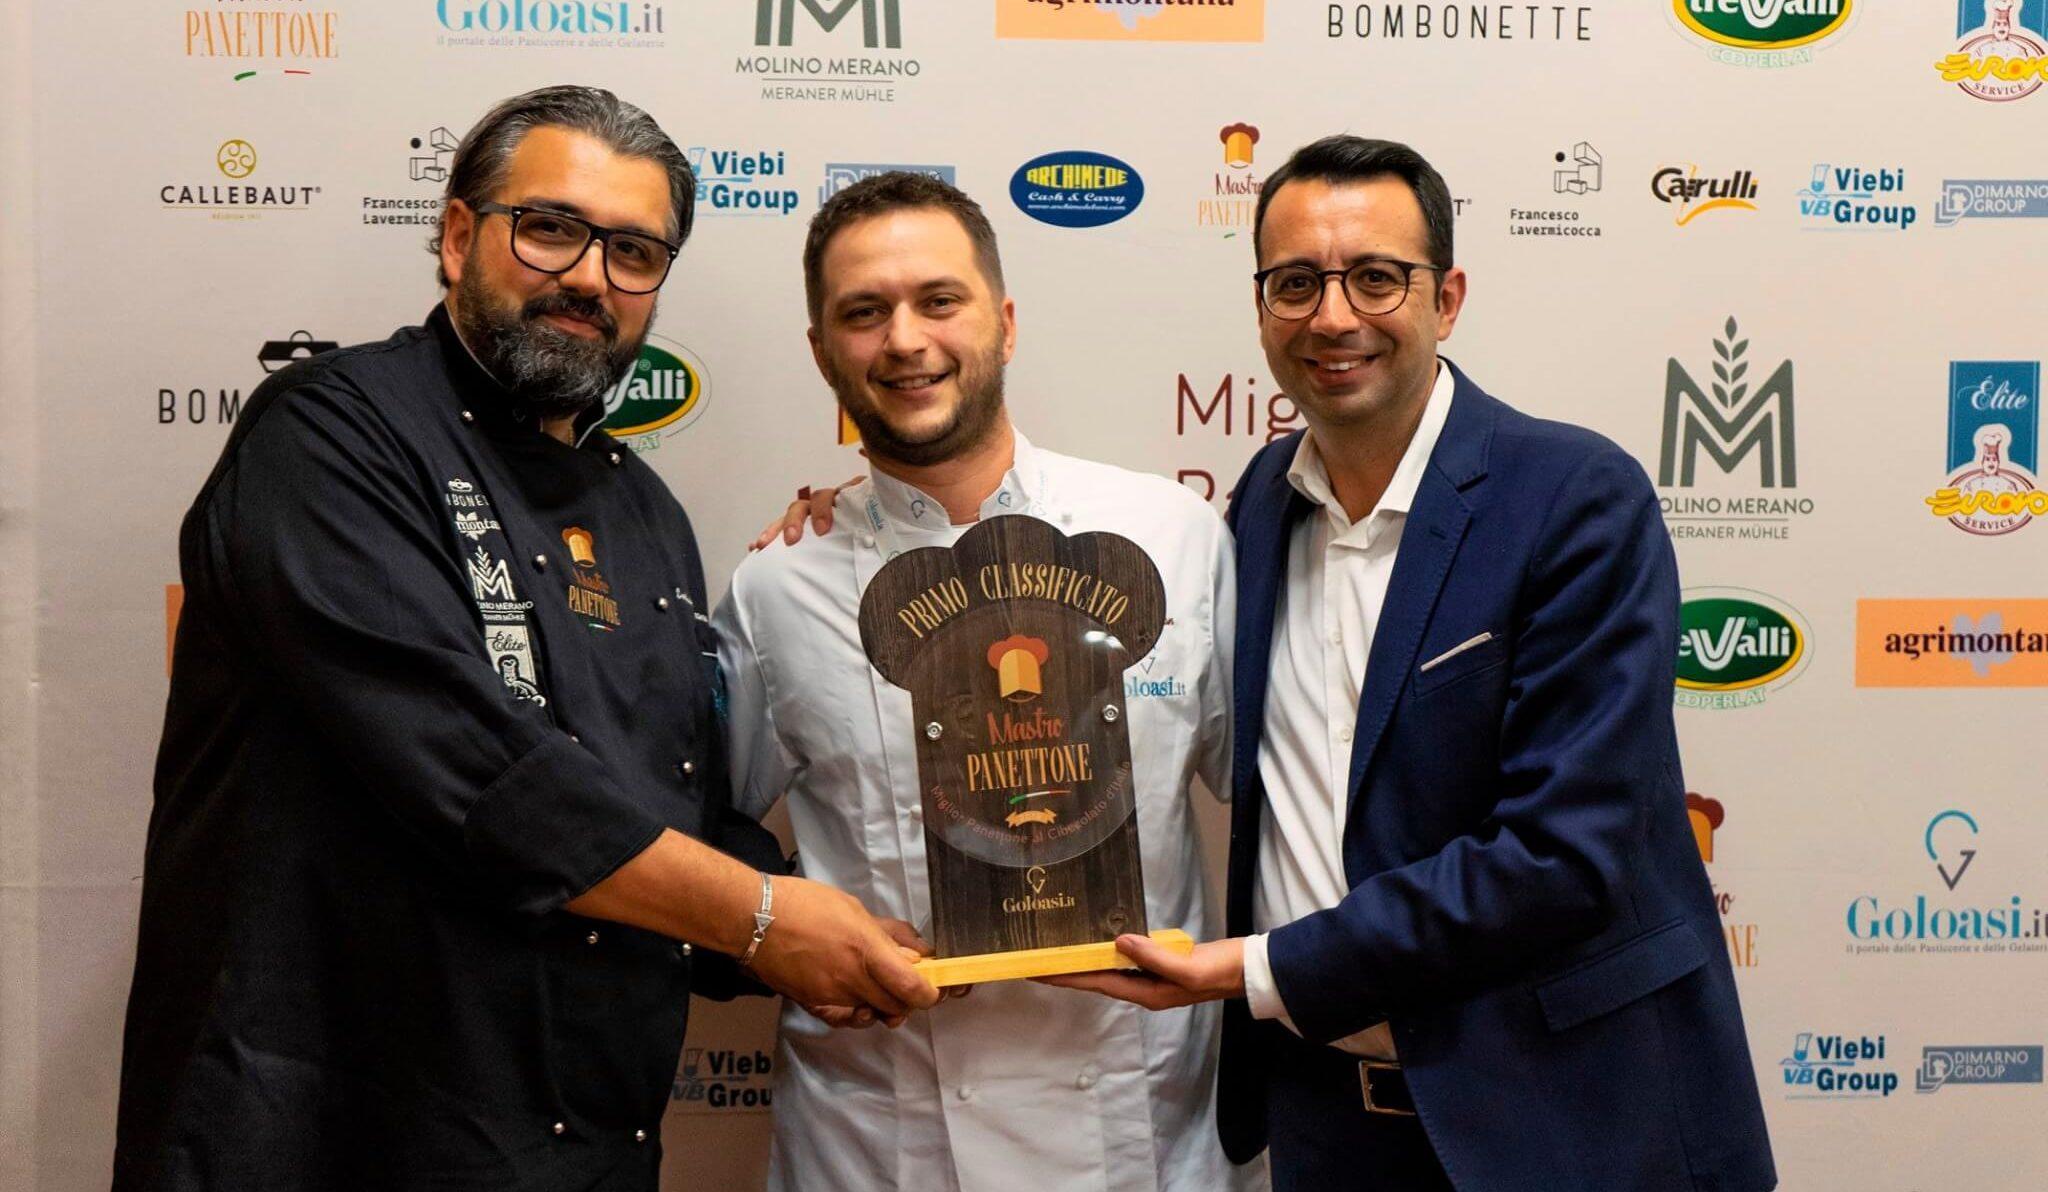 Mastro Panettone 2019 - Goloasi - Dolceria Sapone - Eustachio Sapone 3